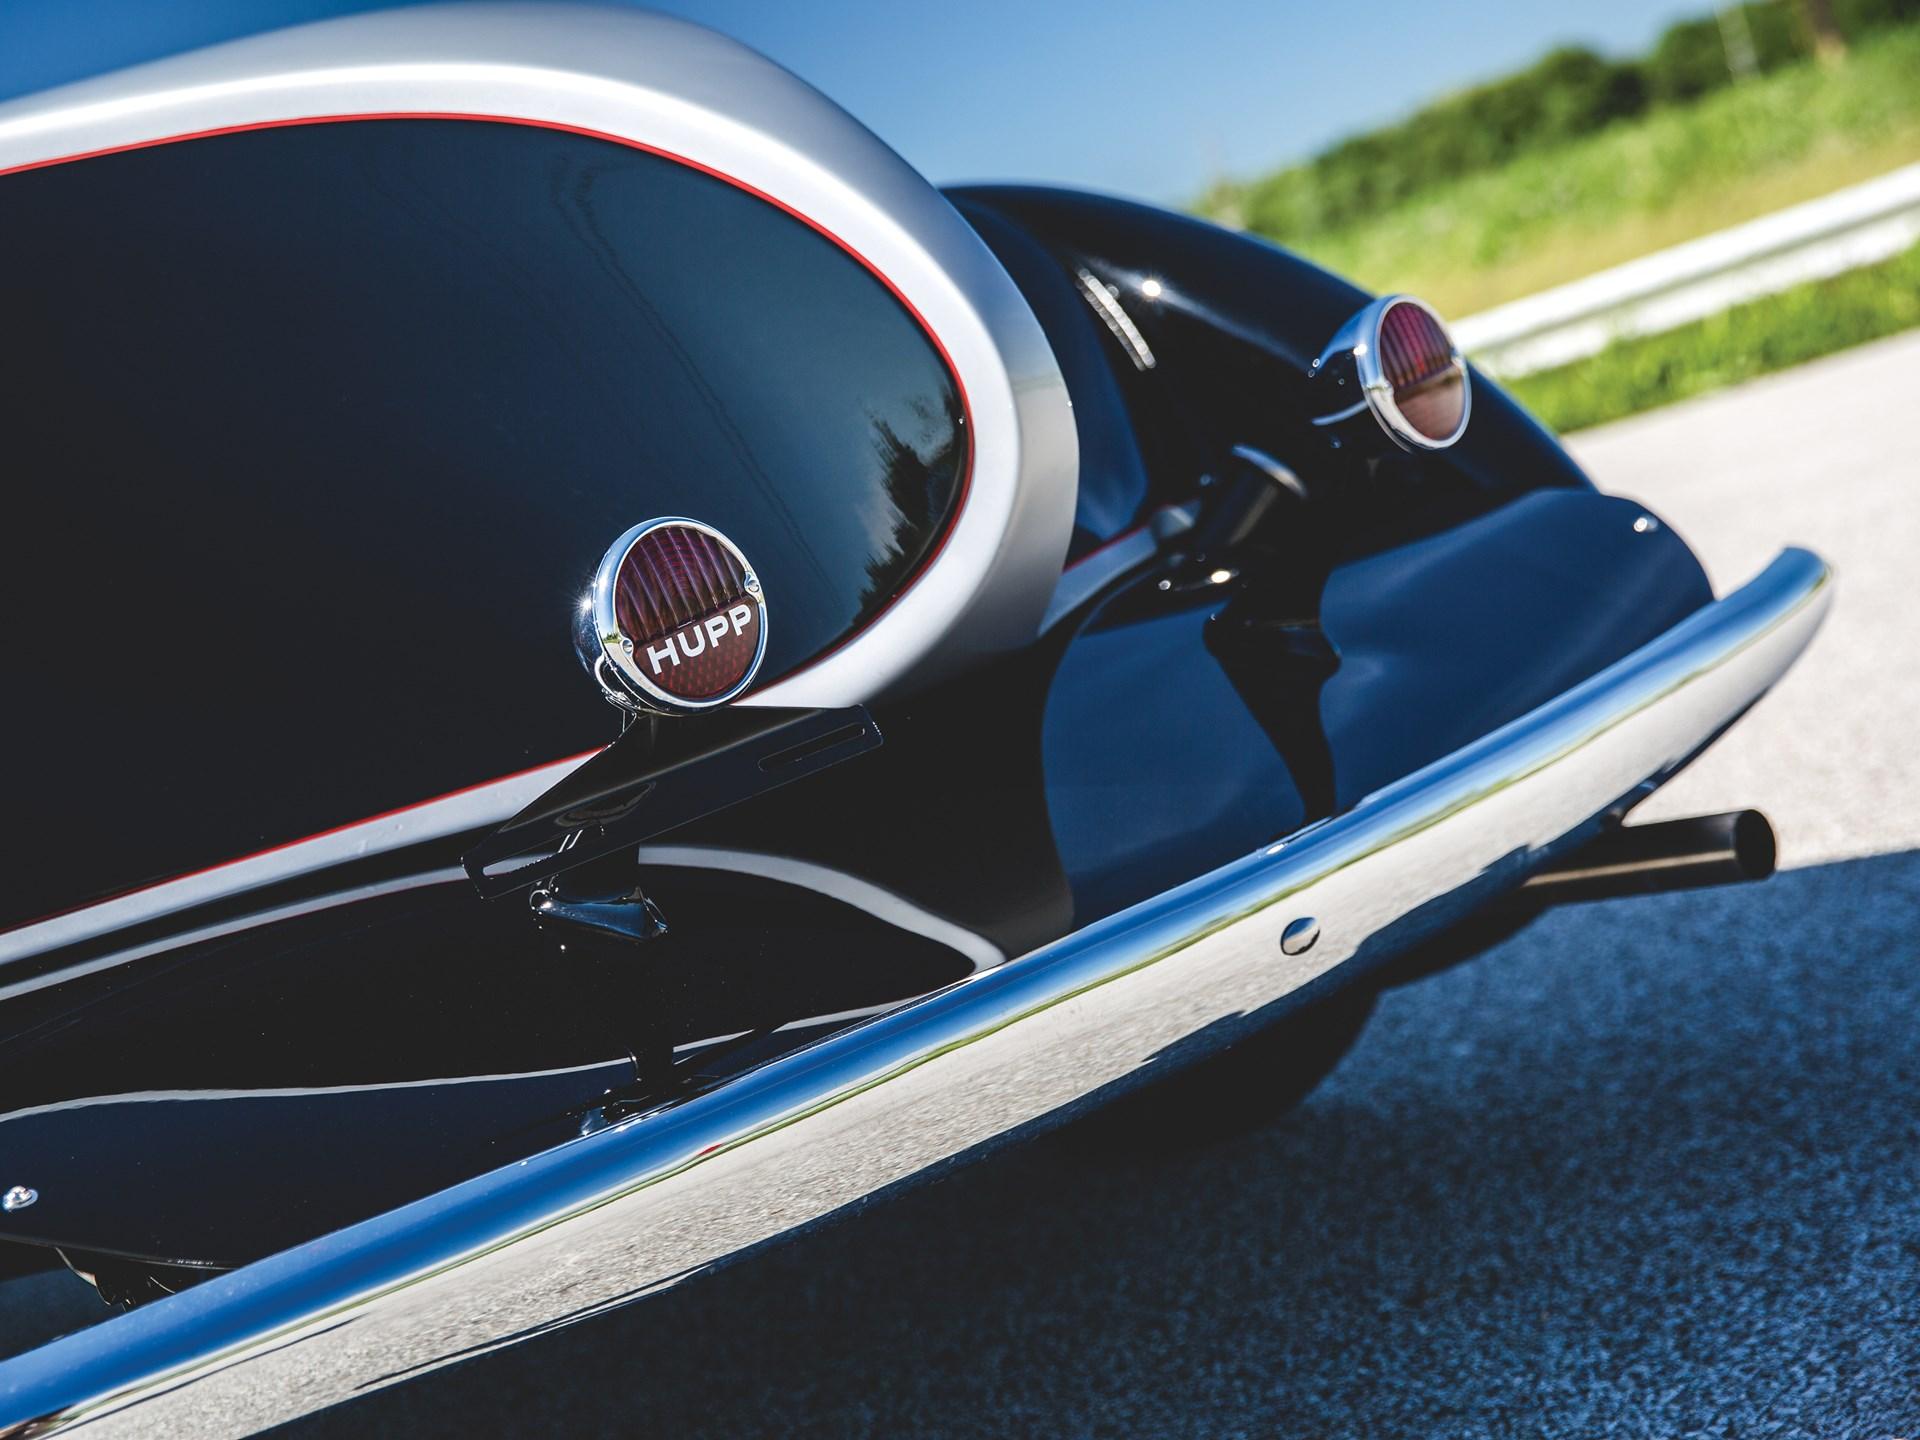 1930 Hupmobile Bonneville Speedster